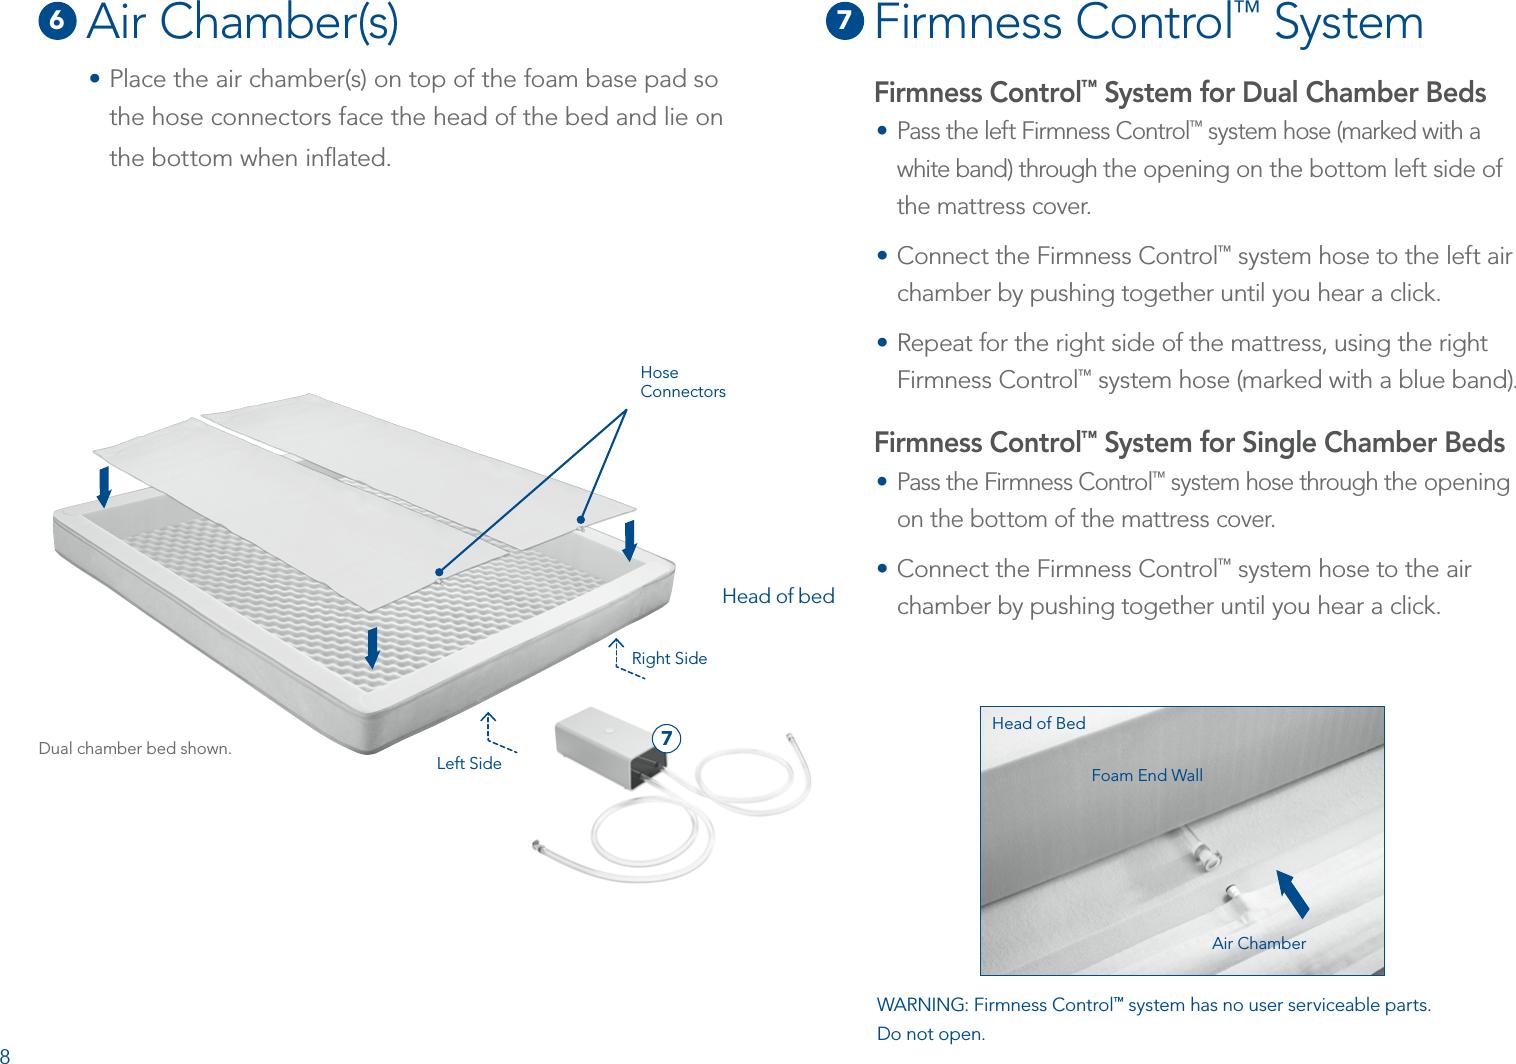 Sleep Number 5000 Universal Remote Control User Manual